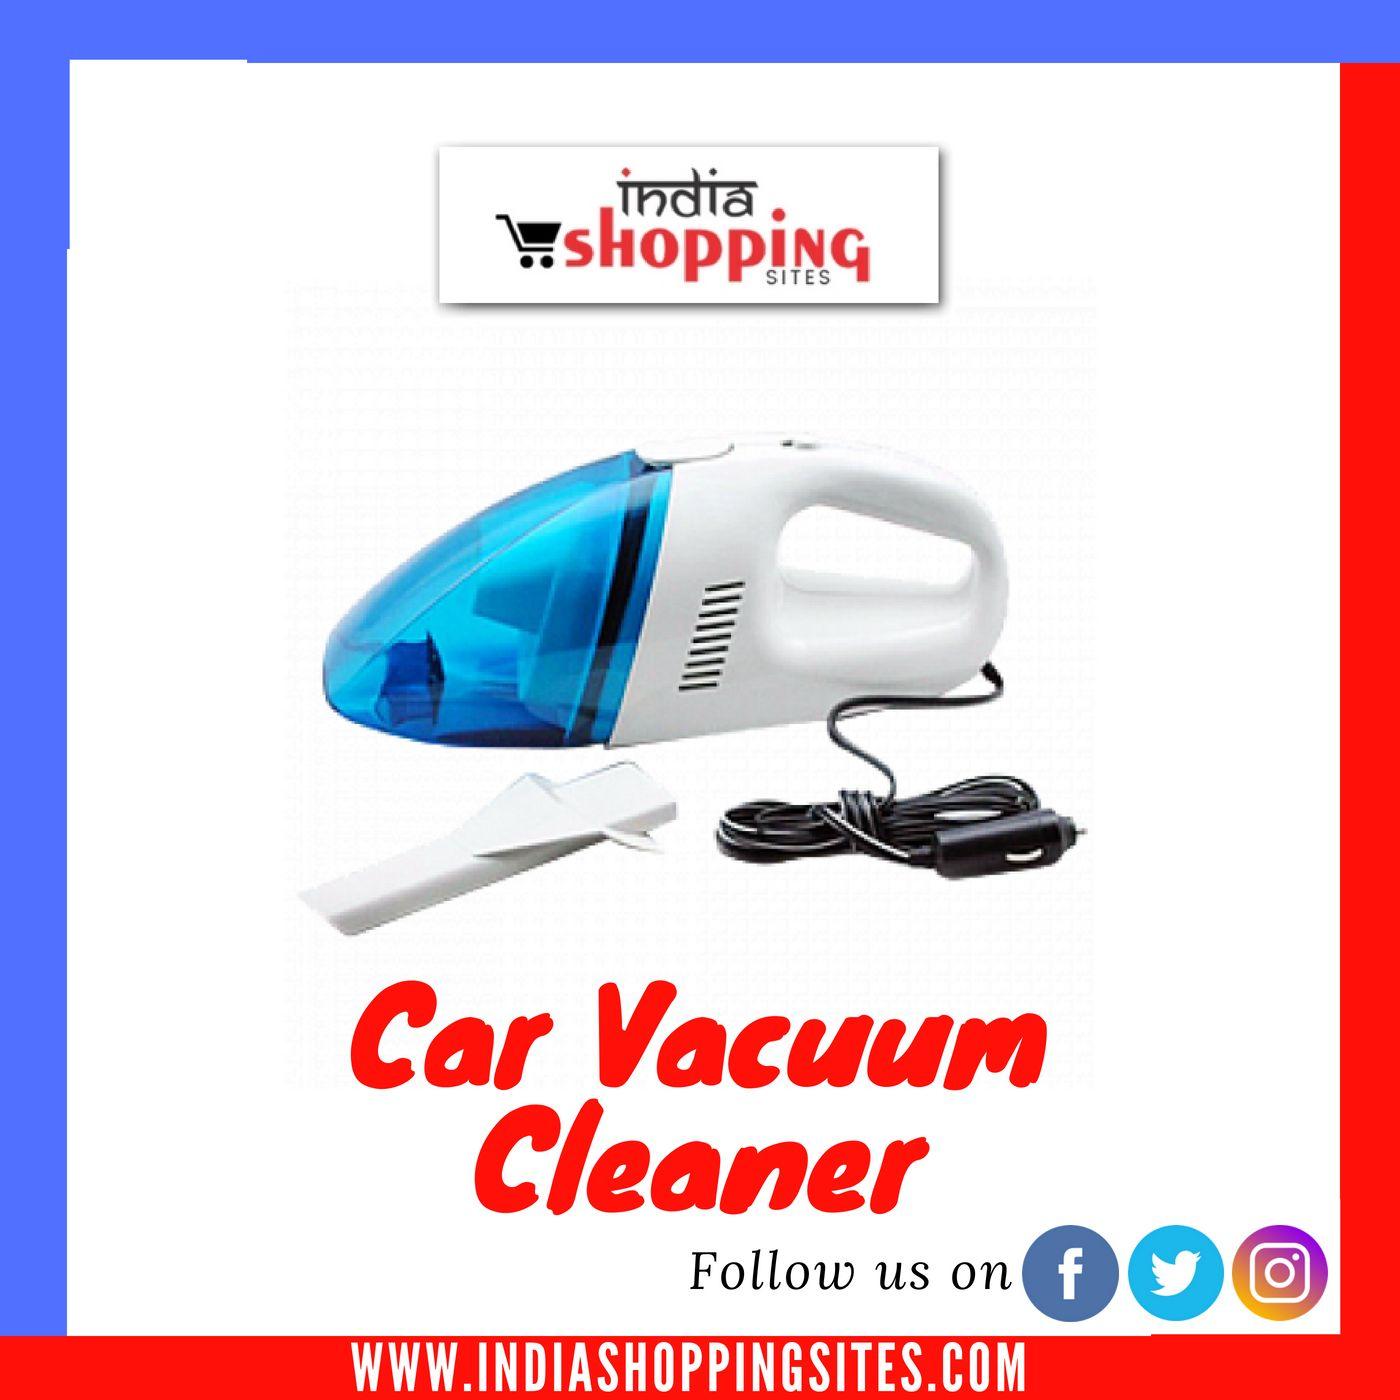 CAR VACUUM CLEANER BUY 1 GET 1 FREE